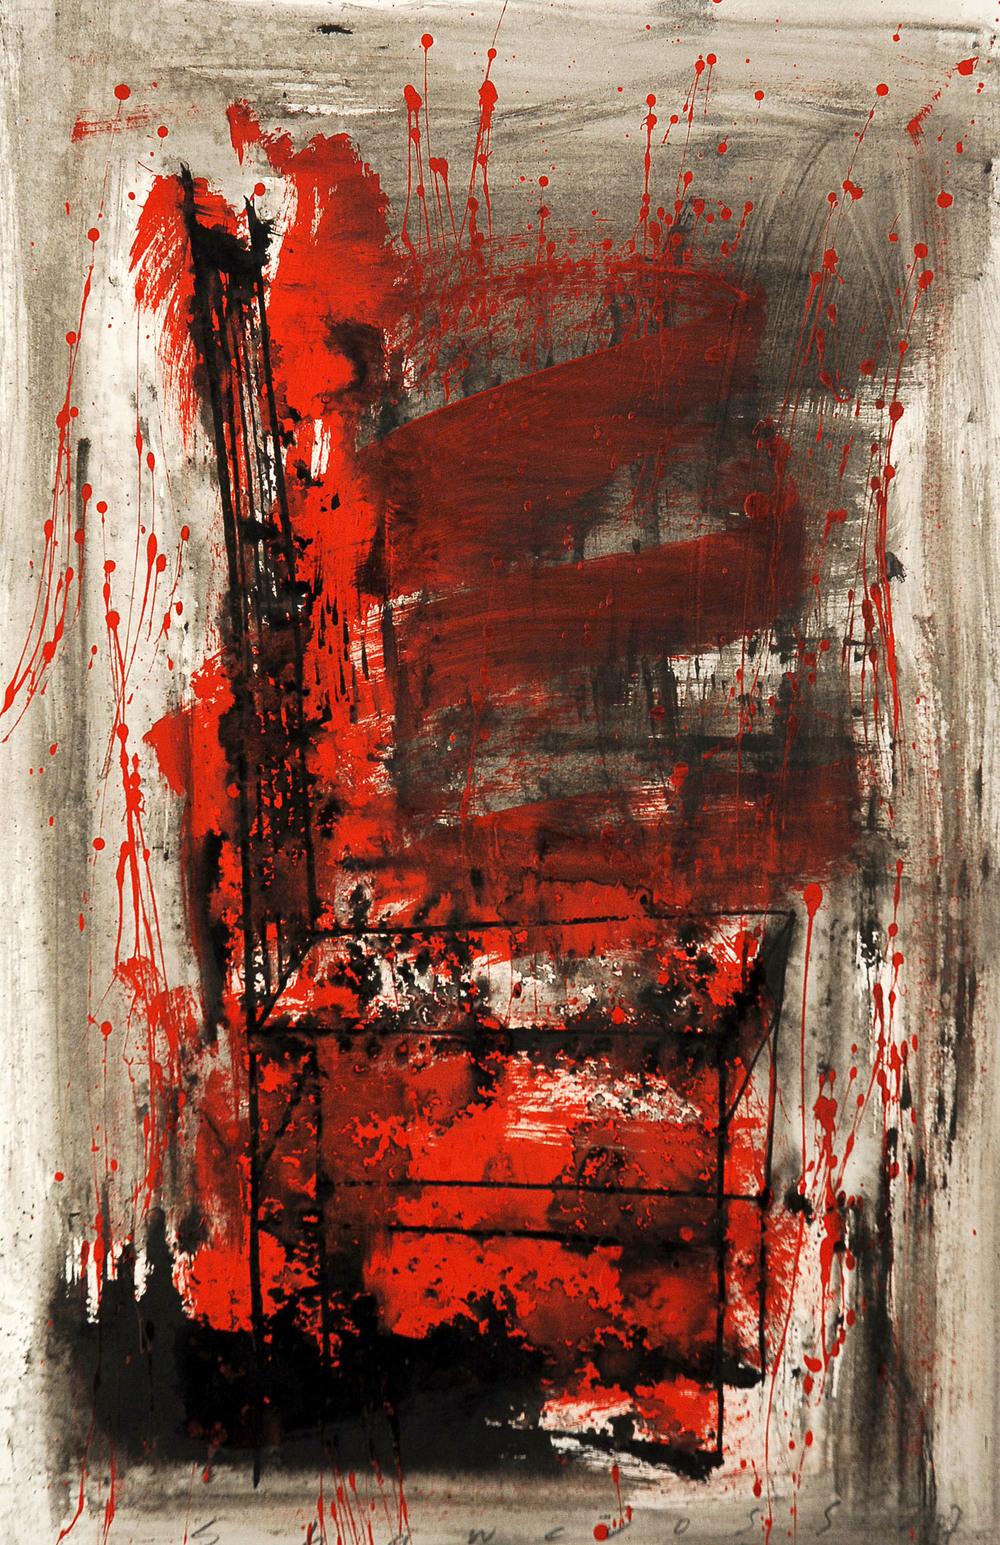 Neil Shawcross_2007_Chair #1_acrylic on paper_51 x 33cm.jpg